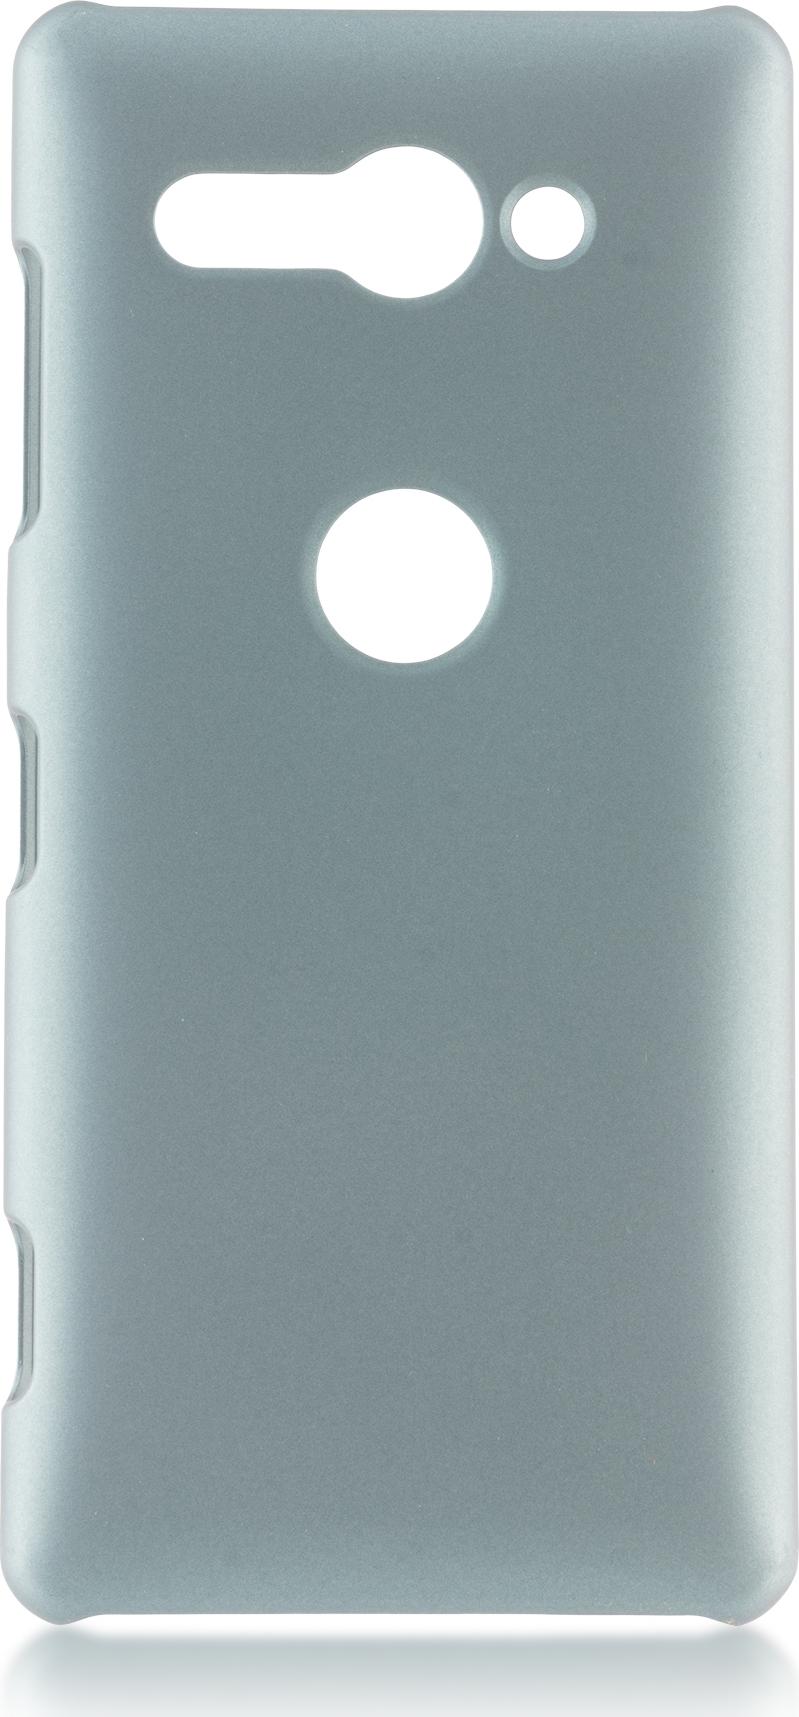 Чехол Brosco Soft-Touch для Sony Xperia XZ2 Compact, зеленый чехол для сотового телефона brosco двухсторонний soft touch для sony xz2 xz2 softtouch pink розовый